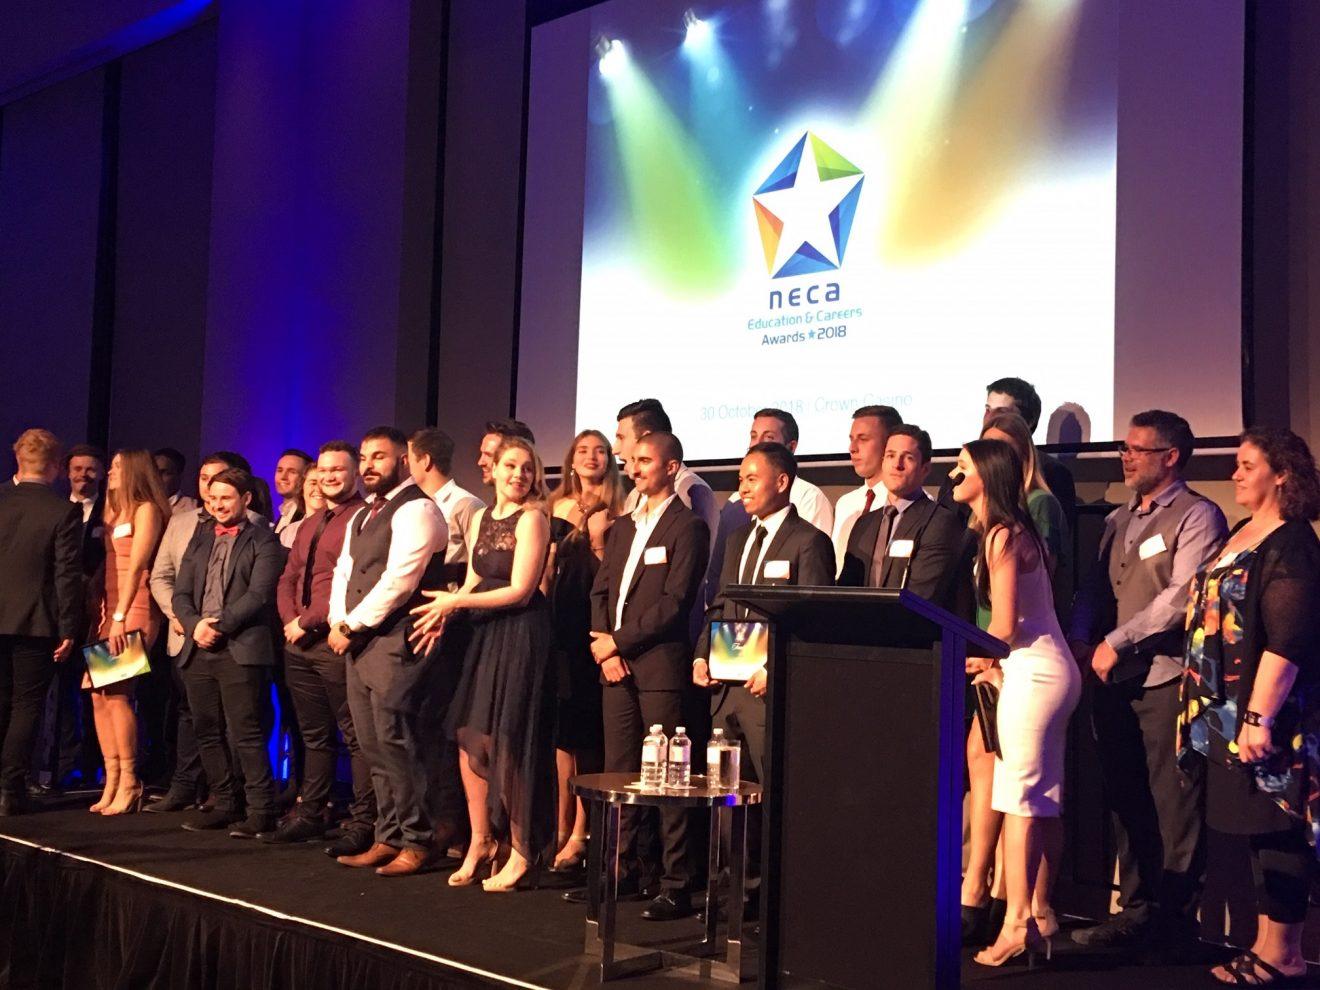 NECA Awards - 2018